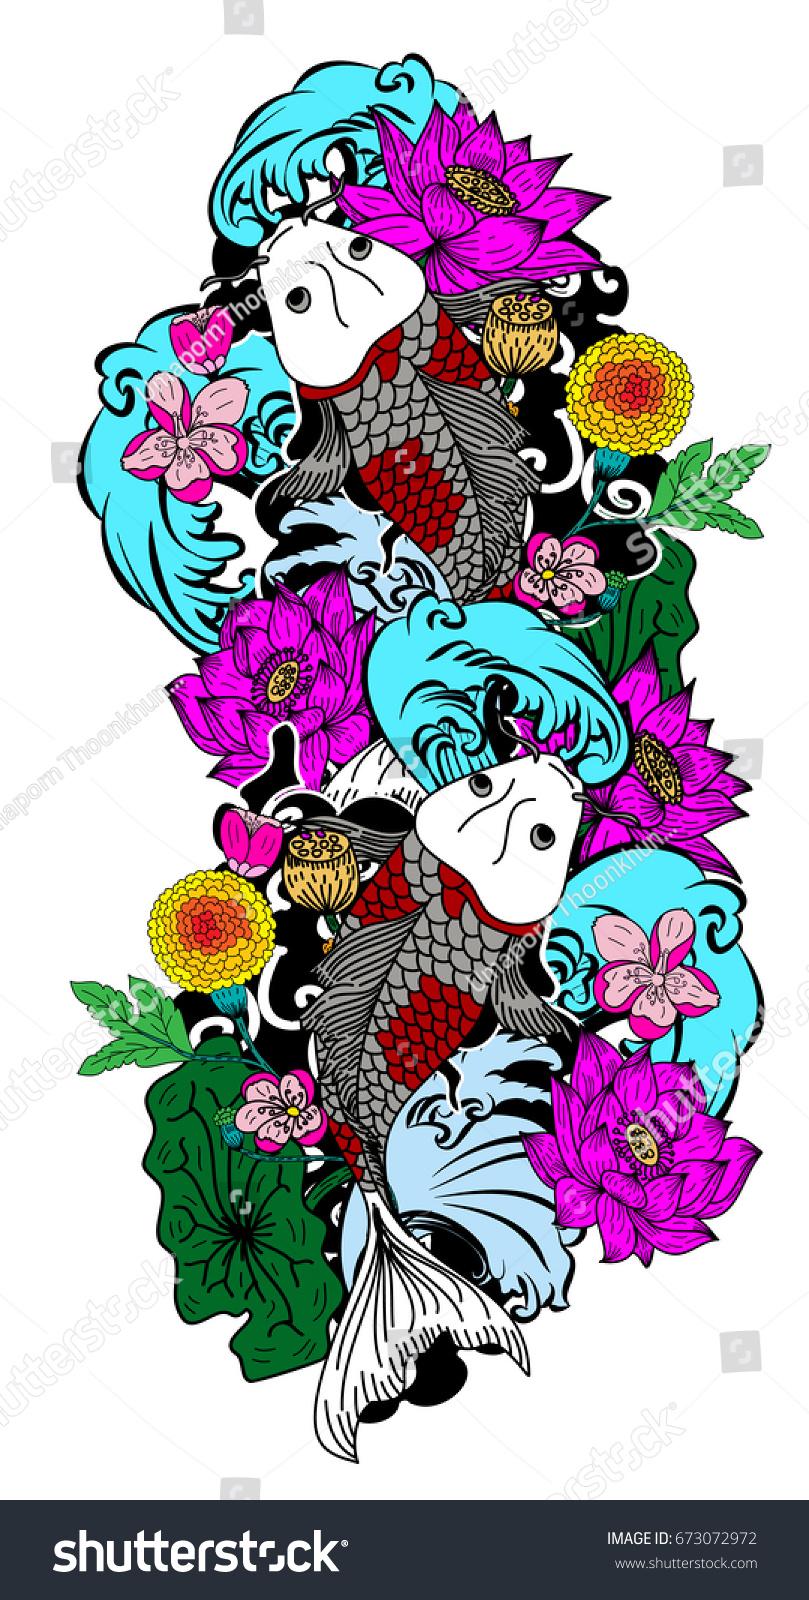 Colorful koi carp fish vectorjapanese tattoo with sakura and lotus colorful koi carp fish vectorjapanese tattoo with sakura and lotus flowerchinese tattoo with marigold flowerchinese fish and wave ez canvas izmirmasajfo